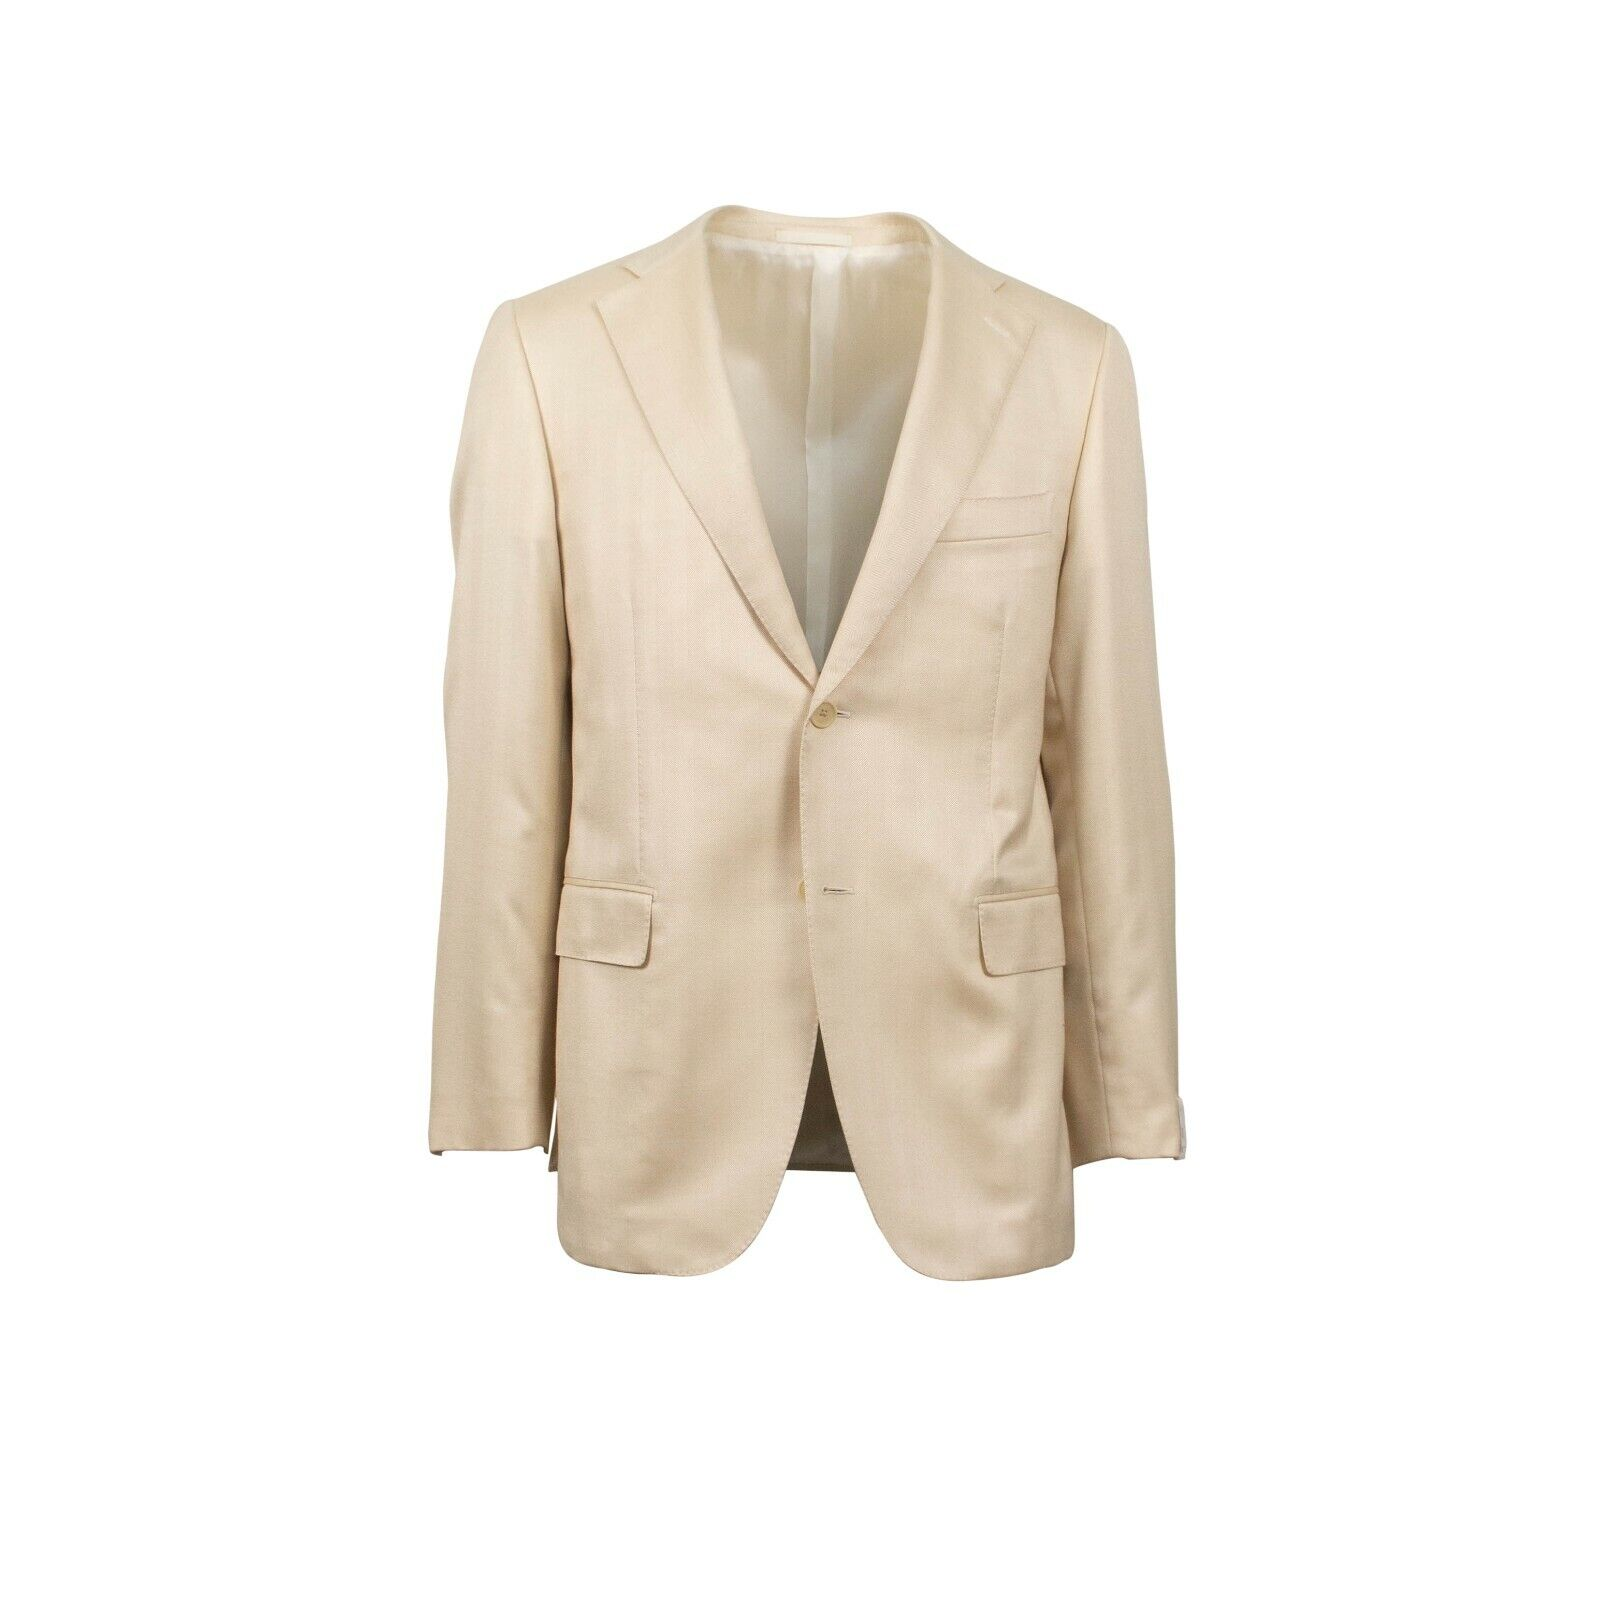 NWT CARUSO Ivory Herringbone 2 Button Silk Blend Sport Coat 48 38 R Drop 6